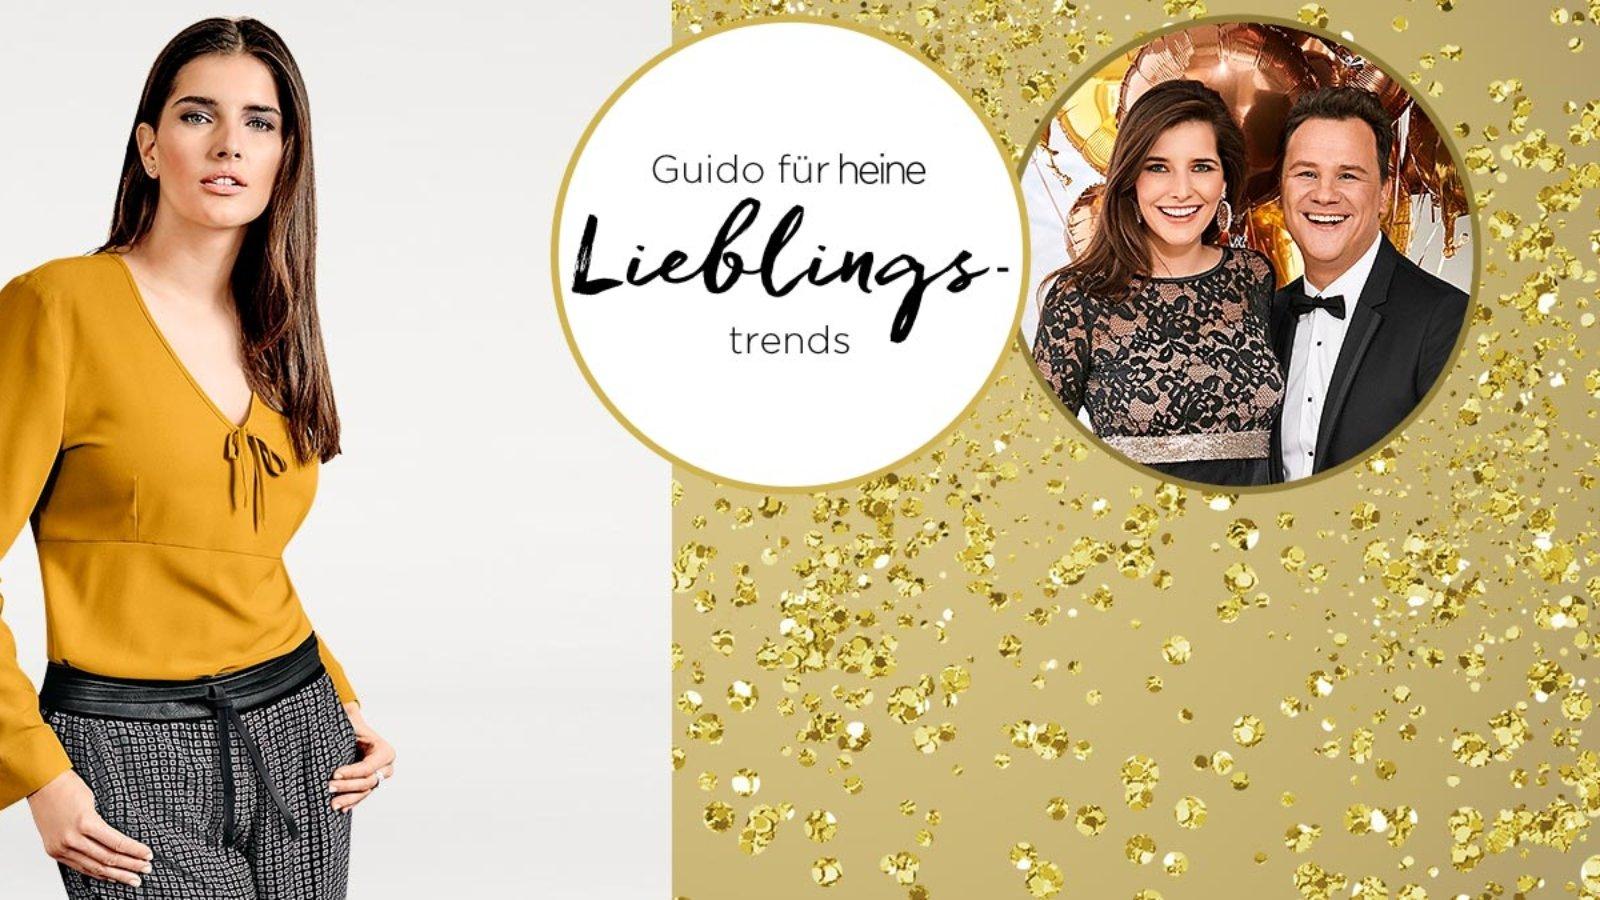 Titel Guido Maria Kretschmer by Heine Lieblingstrends